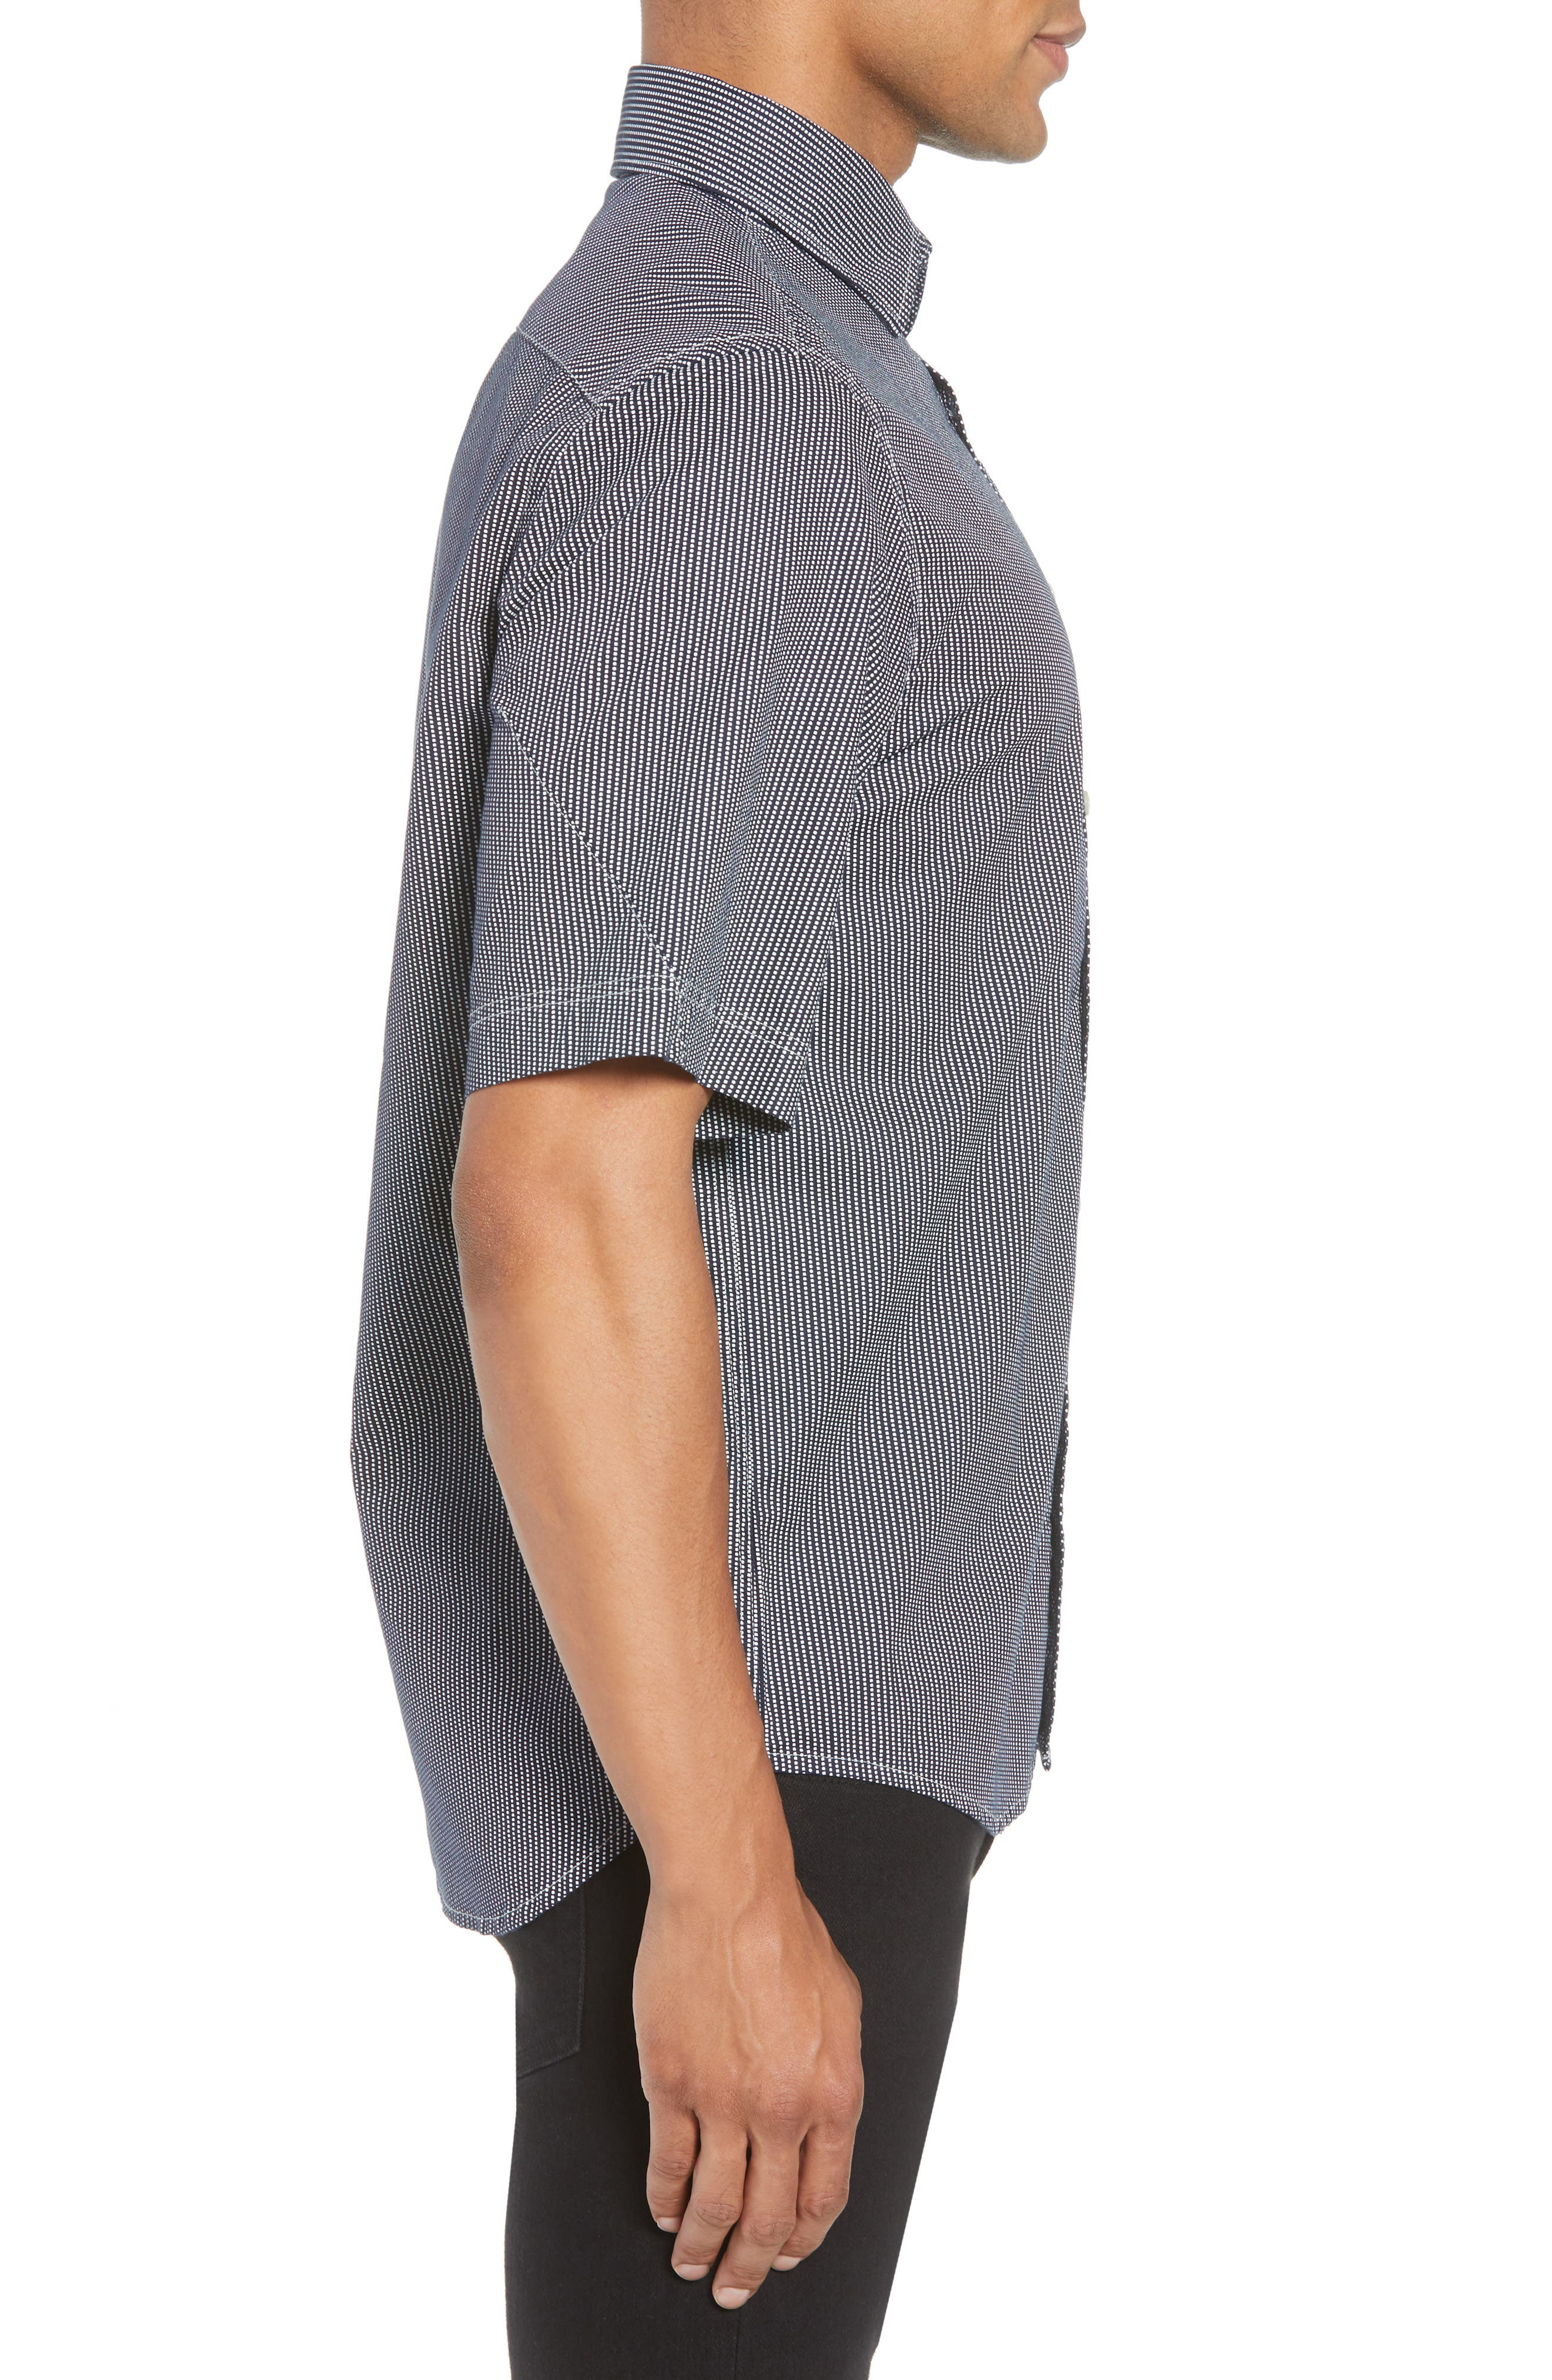 Bristum Straight Ref Shirt,                             Alternate thumbnail 3, color,                             Sartho Blue/ Milk